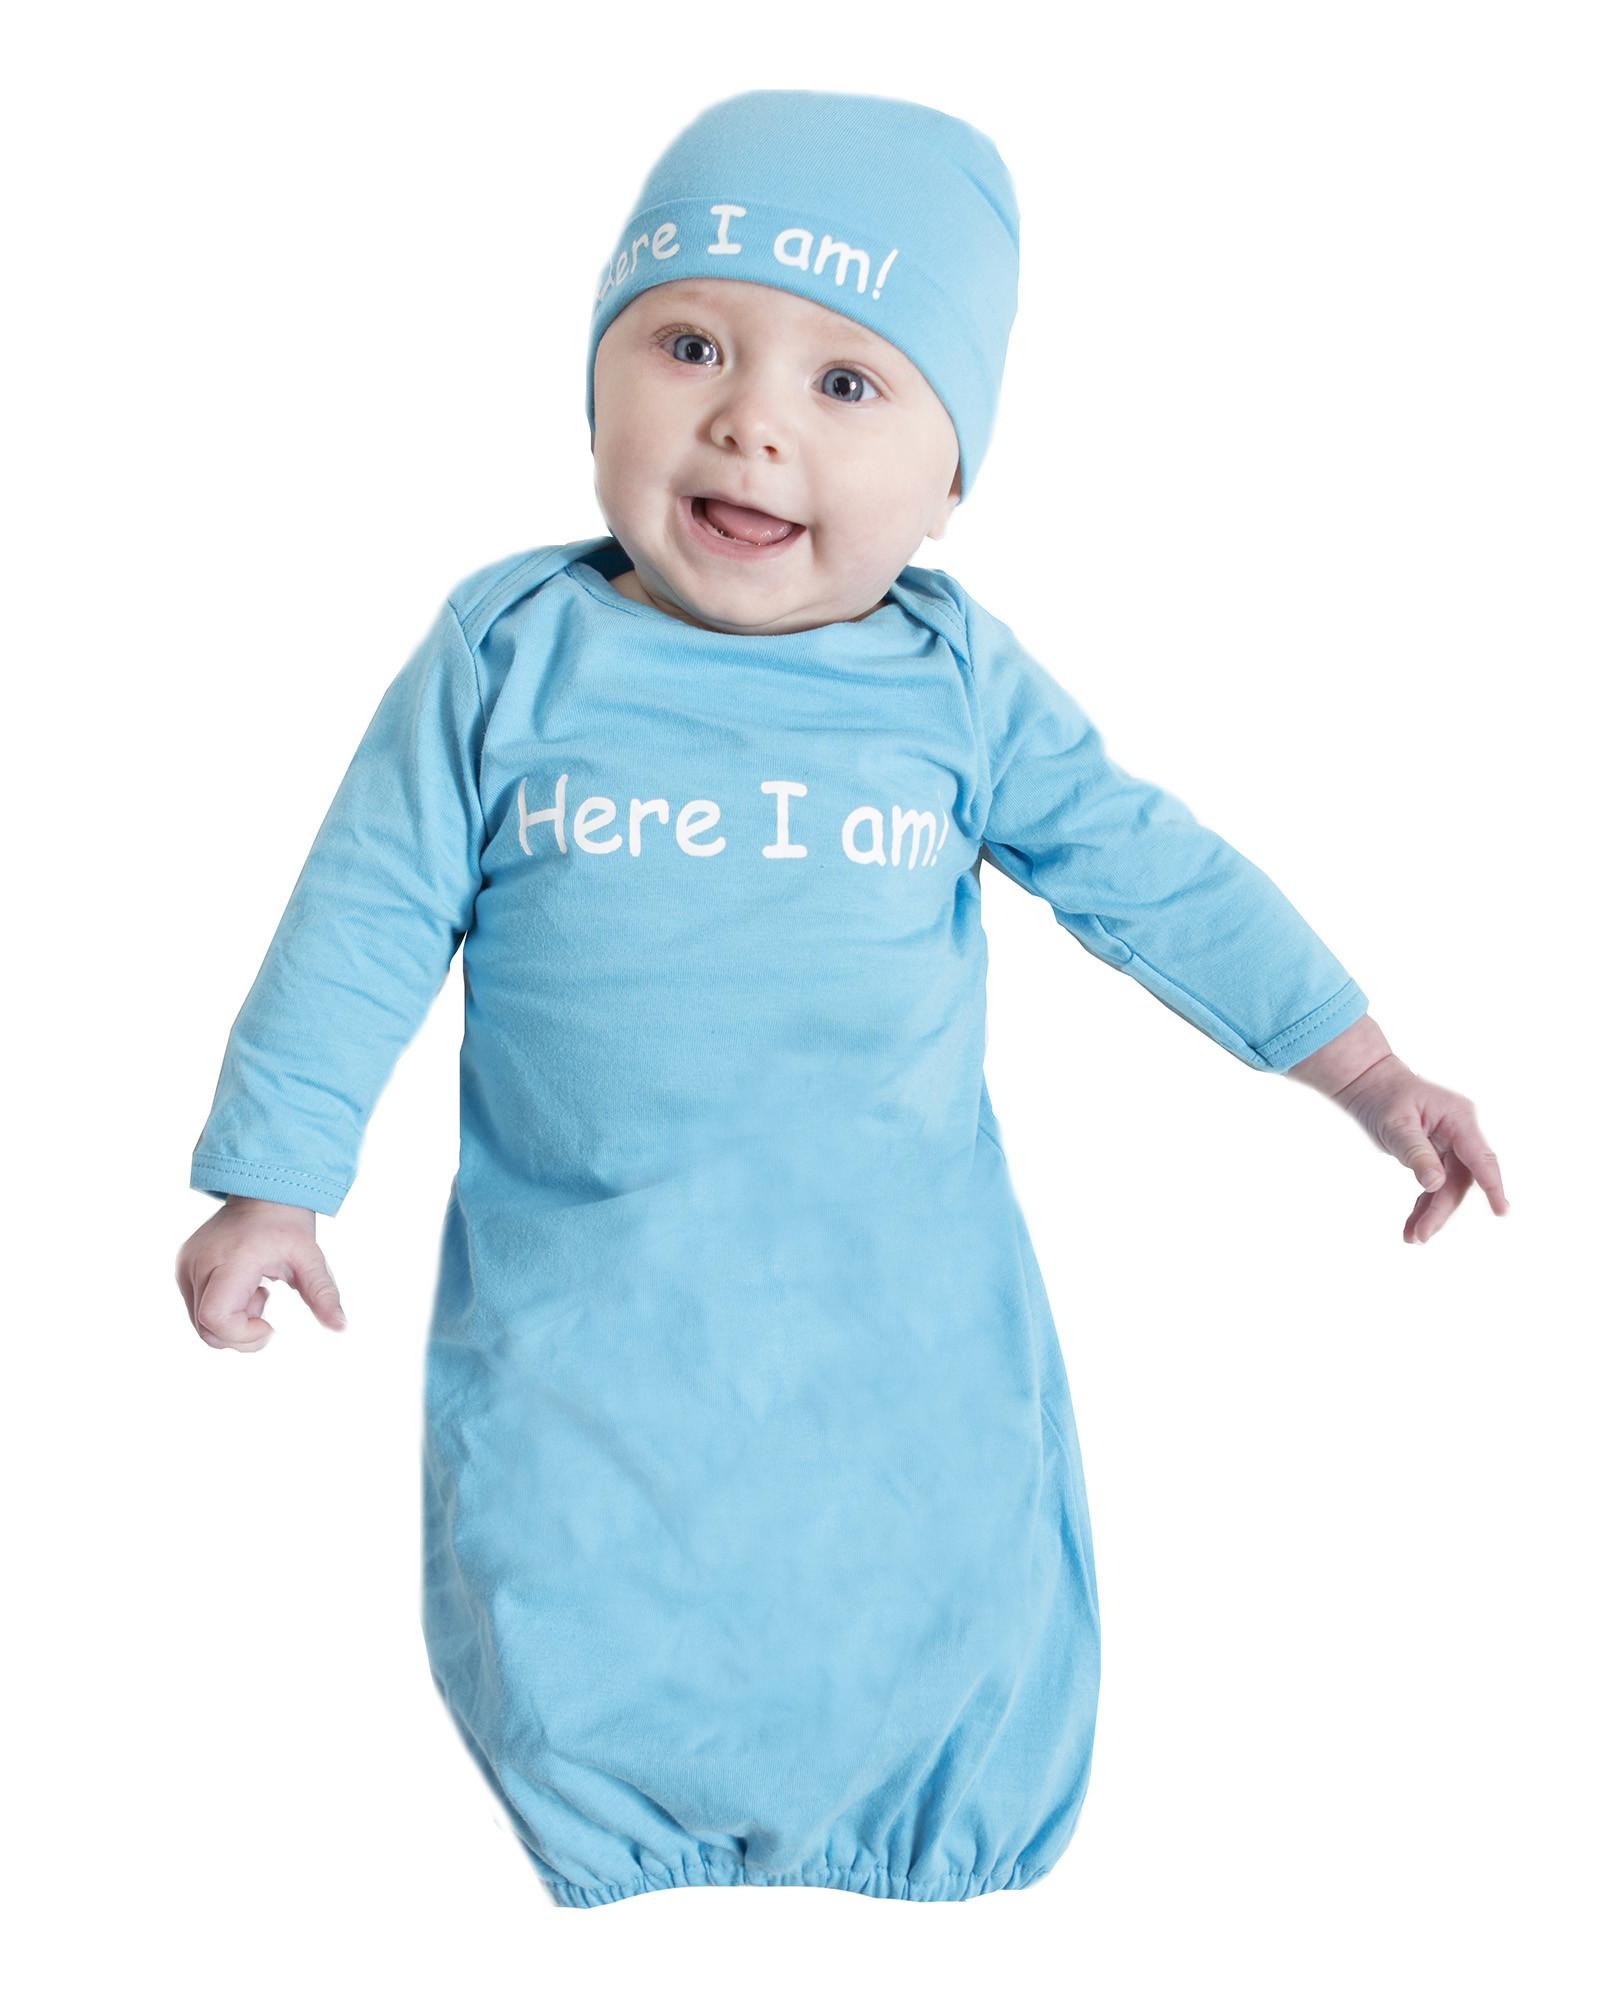 Baby romper & hat set | DueSoon Australia